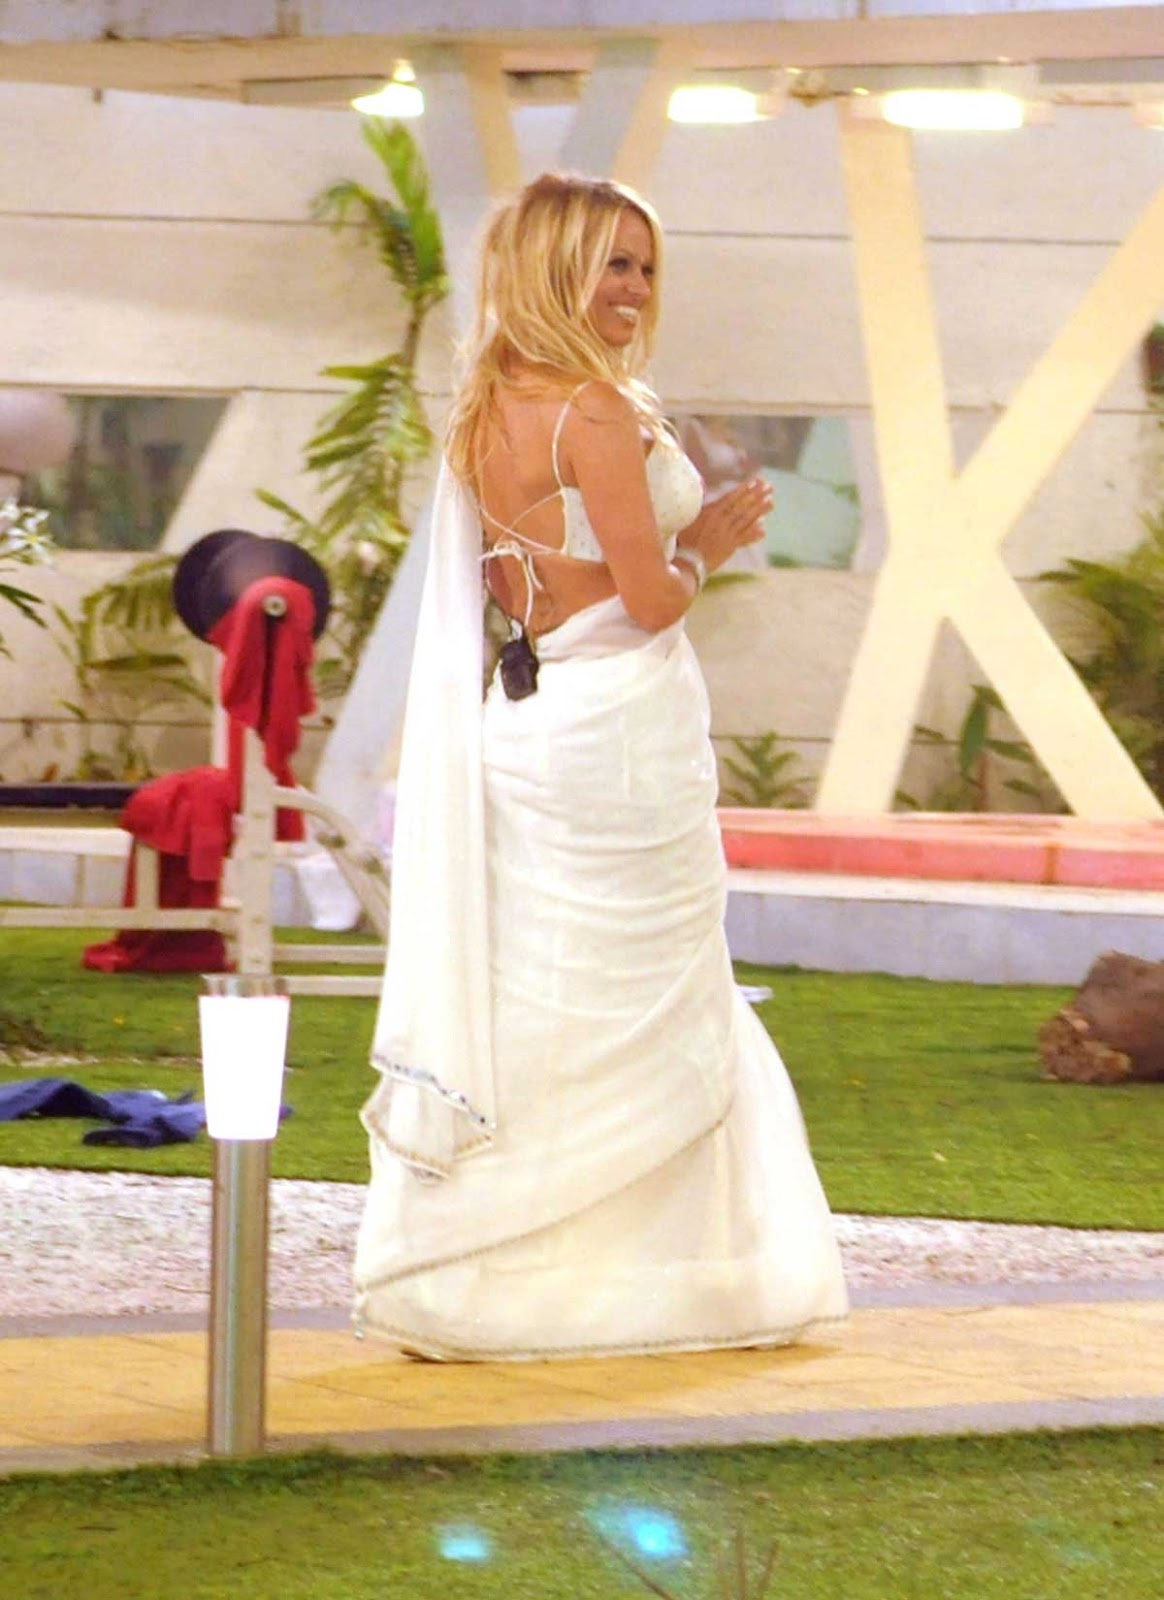 http://1.bp.blogspot.com/-qWM7ickj5pE/UEh-IGA8VwI/AAAAAAAAFtg/kwBqD2XZWME/s1600/Pamela+Anderson+In+White+Saree.jpg